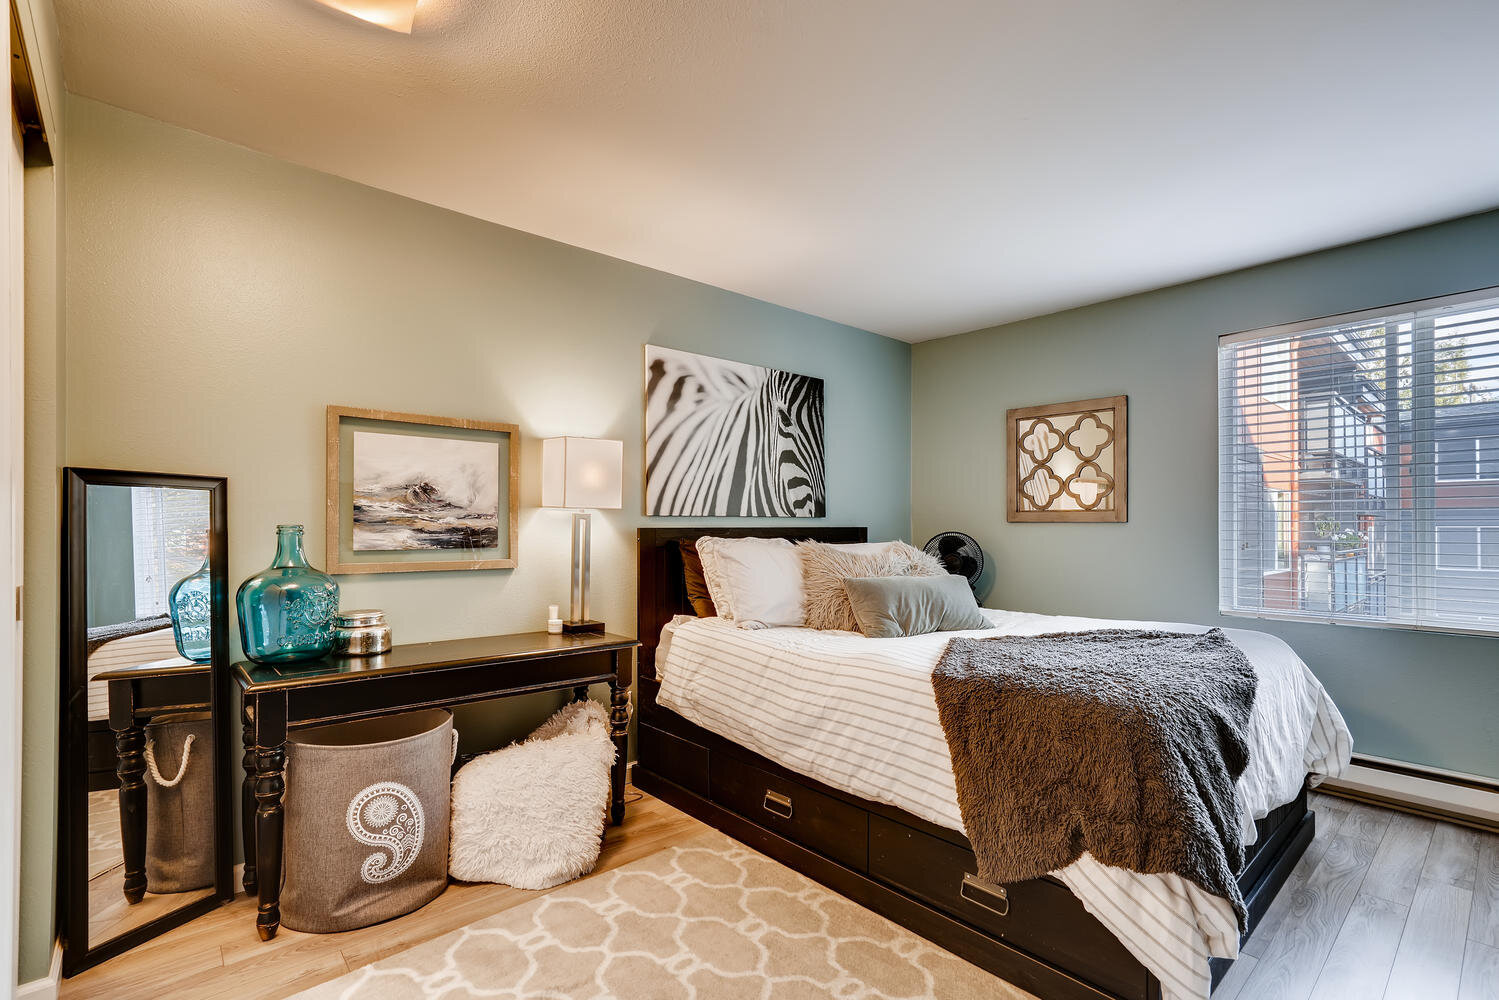 7021 Sand Point Way  B210-large-014-014-Master Bedroom-1500x1000-72dpi.jpg